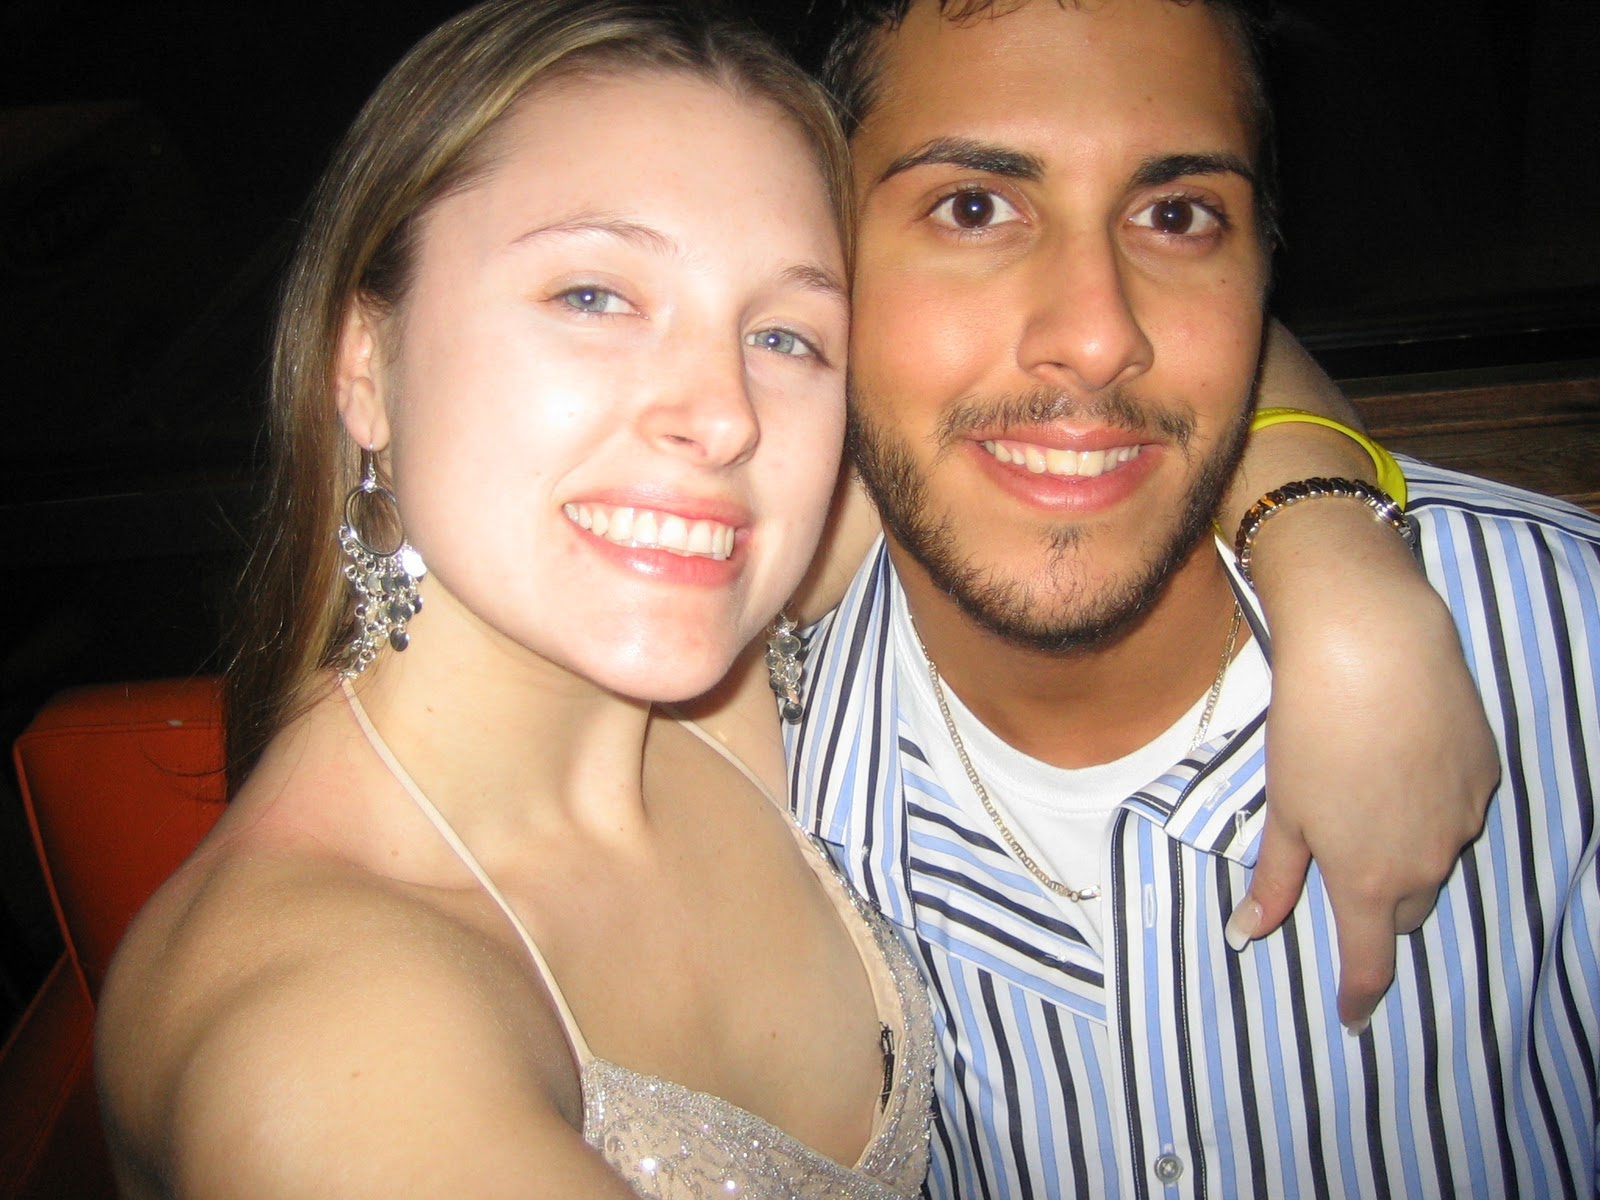 Quadriplegic woman dating